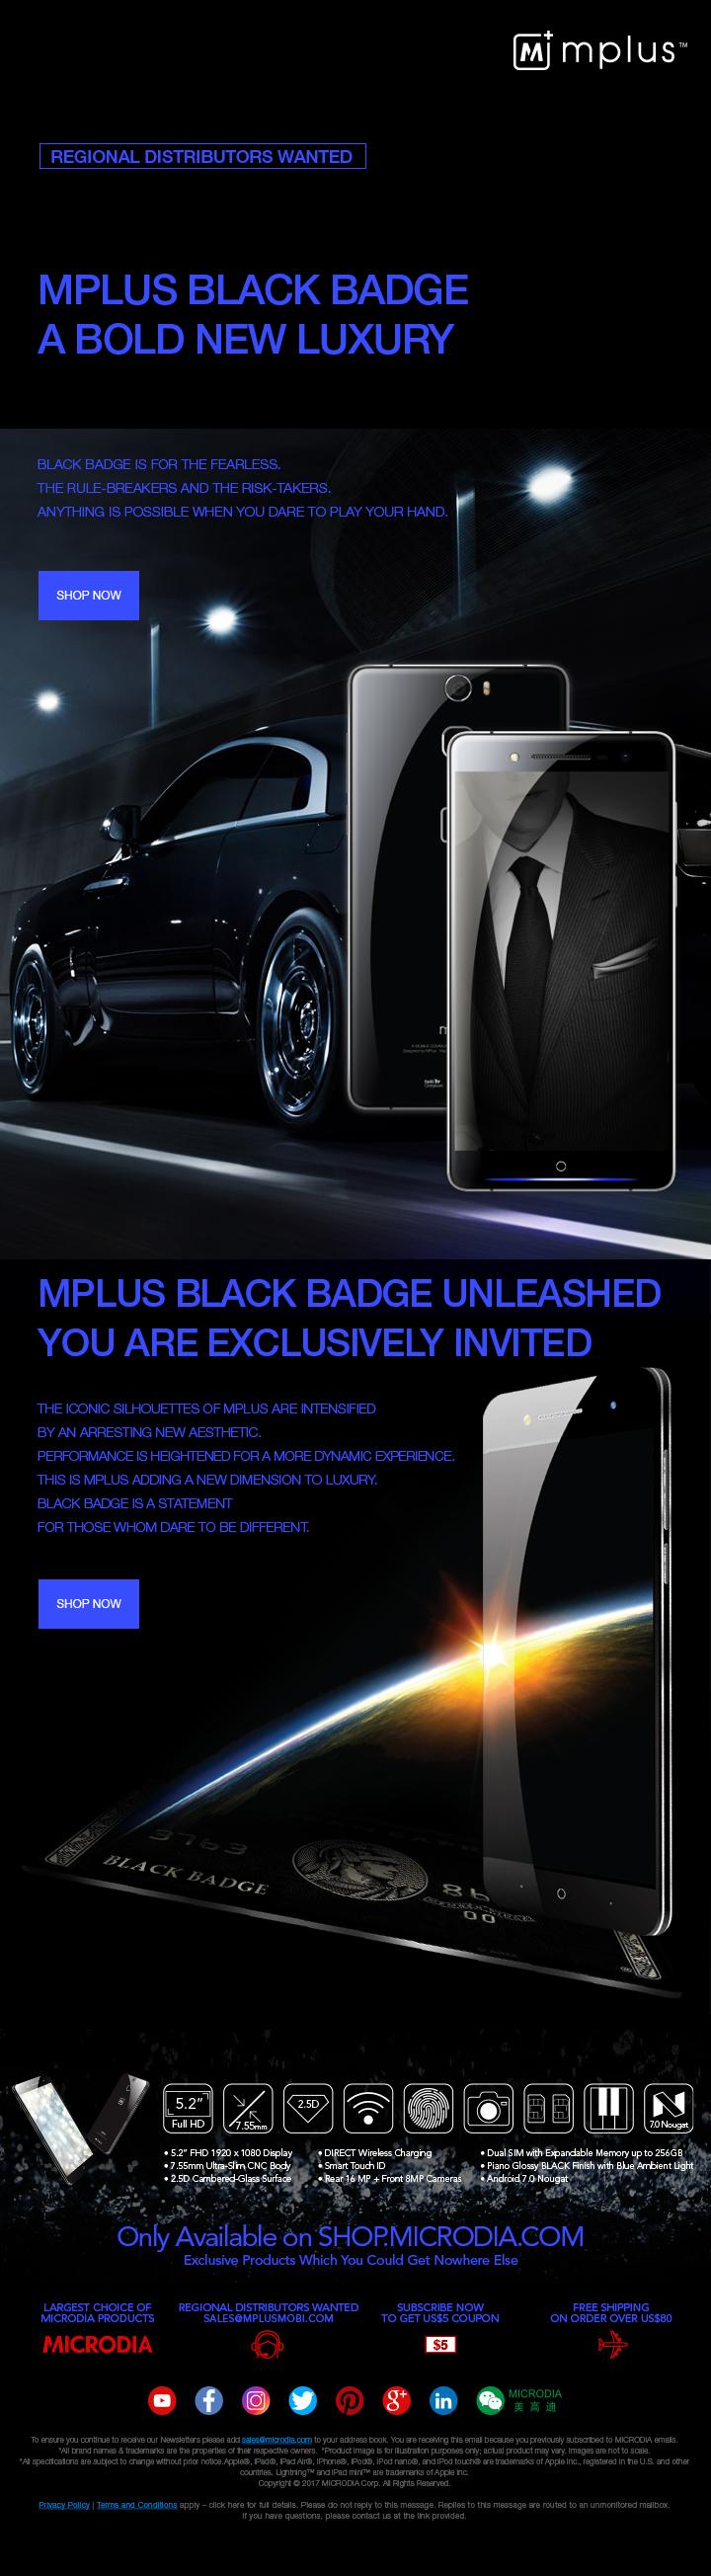 BLACK BADGE - A Bold New Luxury